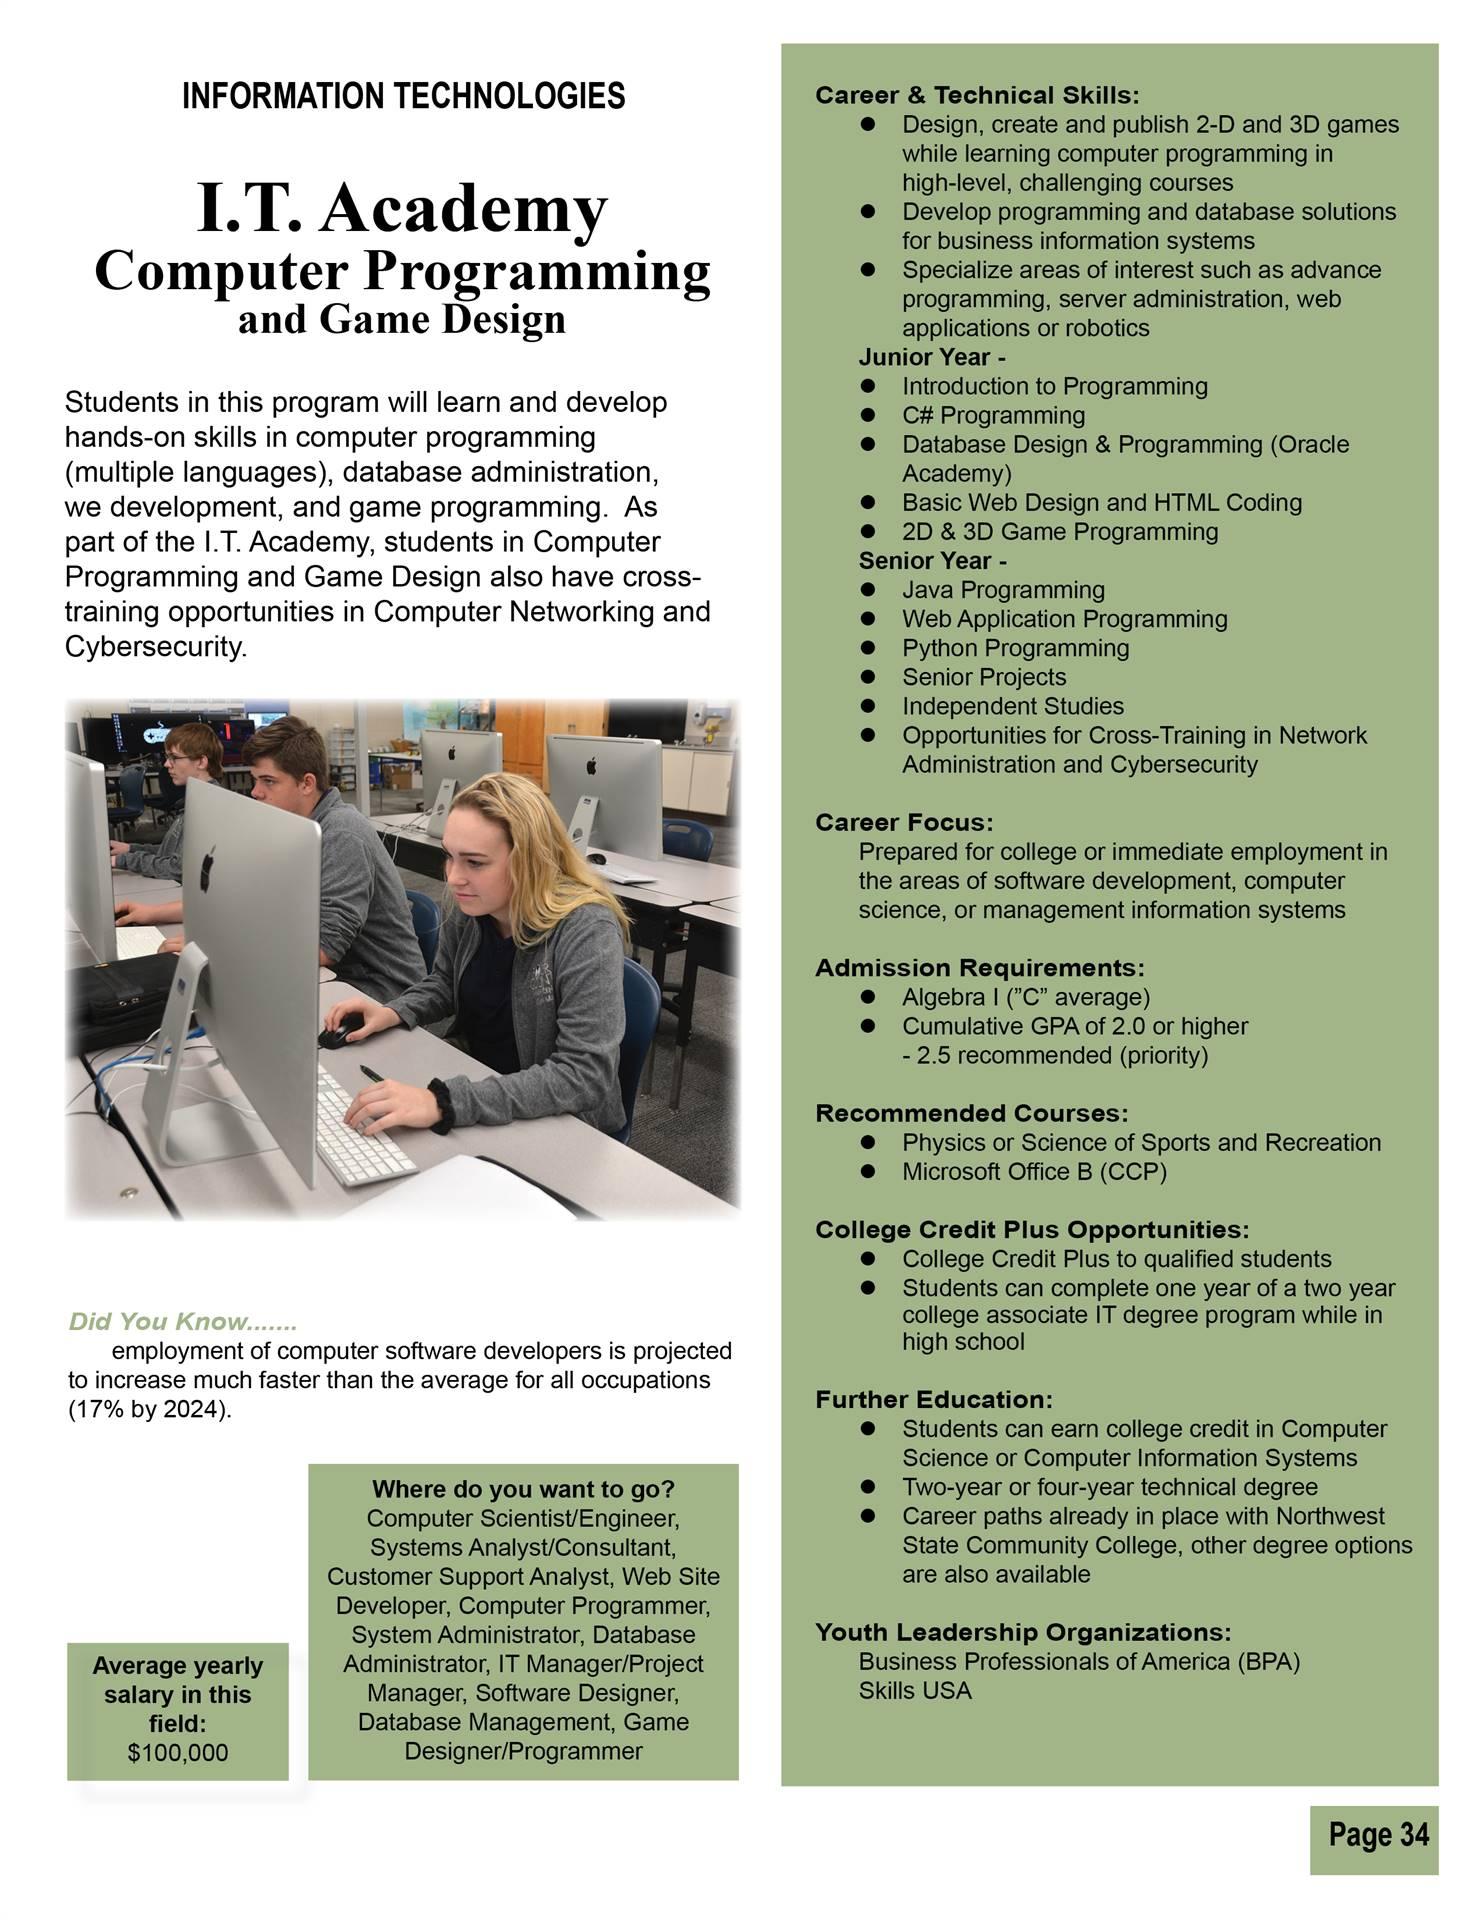 Software Development & Game Design